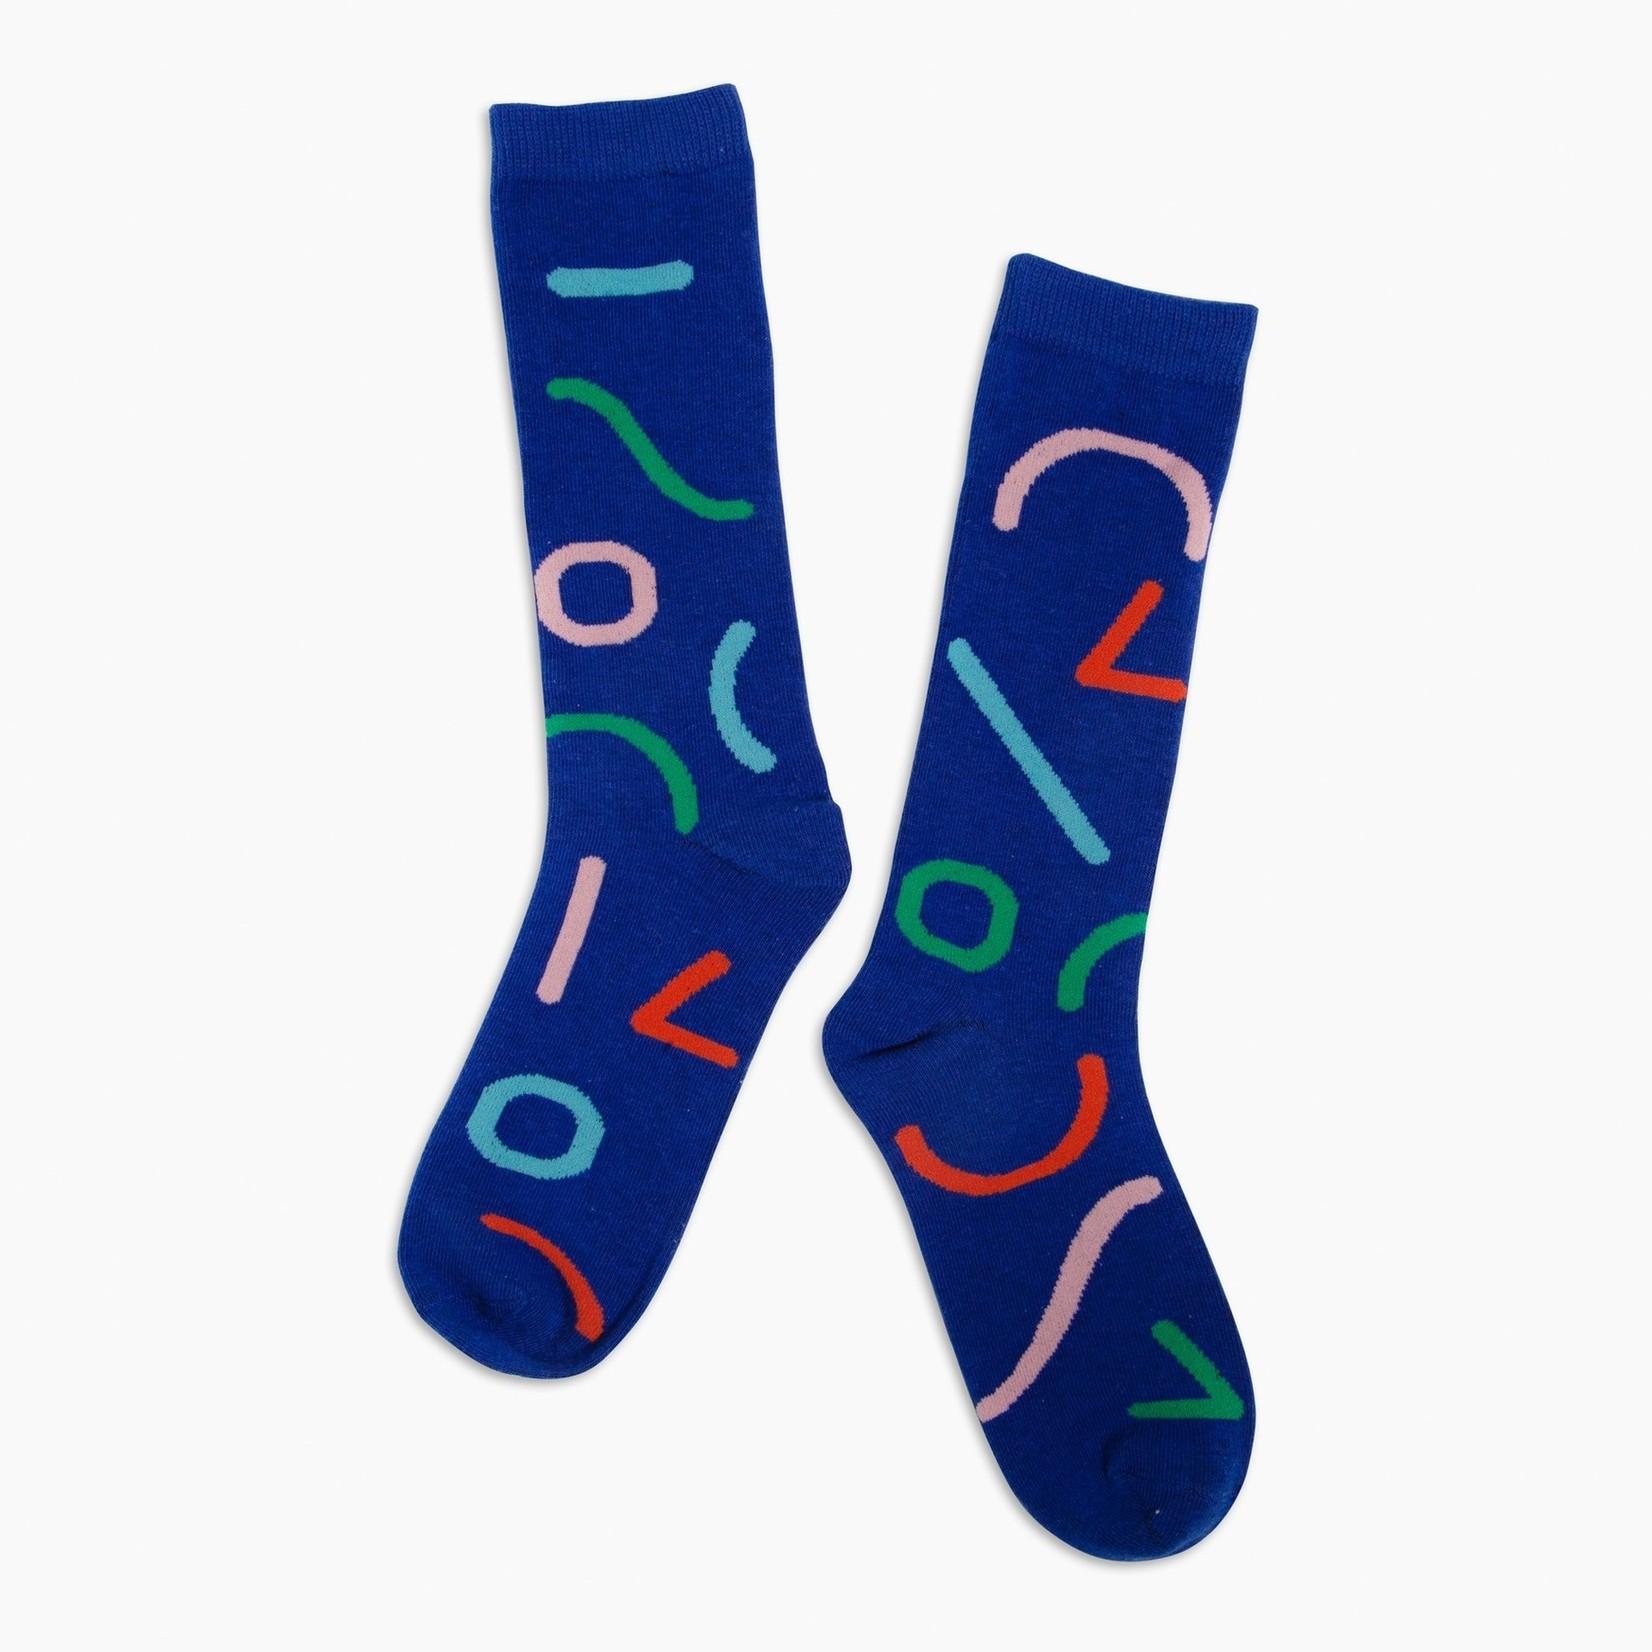 Poketo Crew Socks Outline